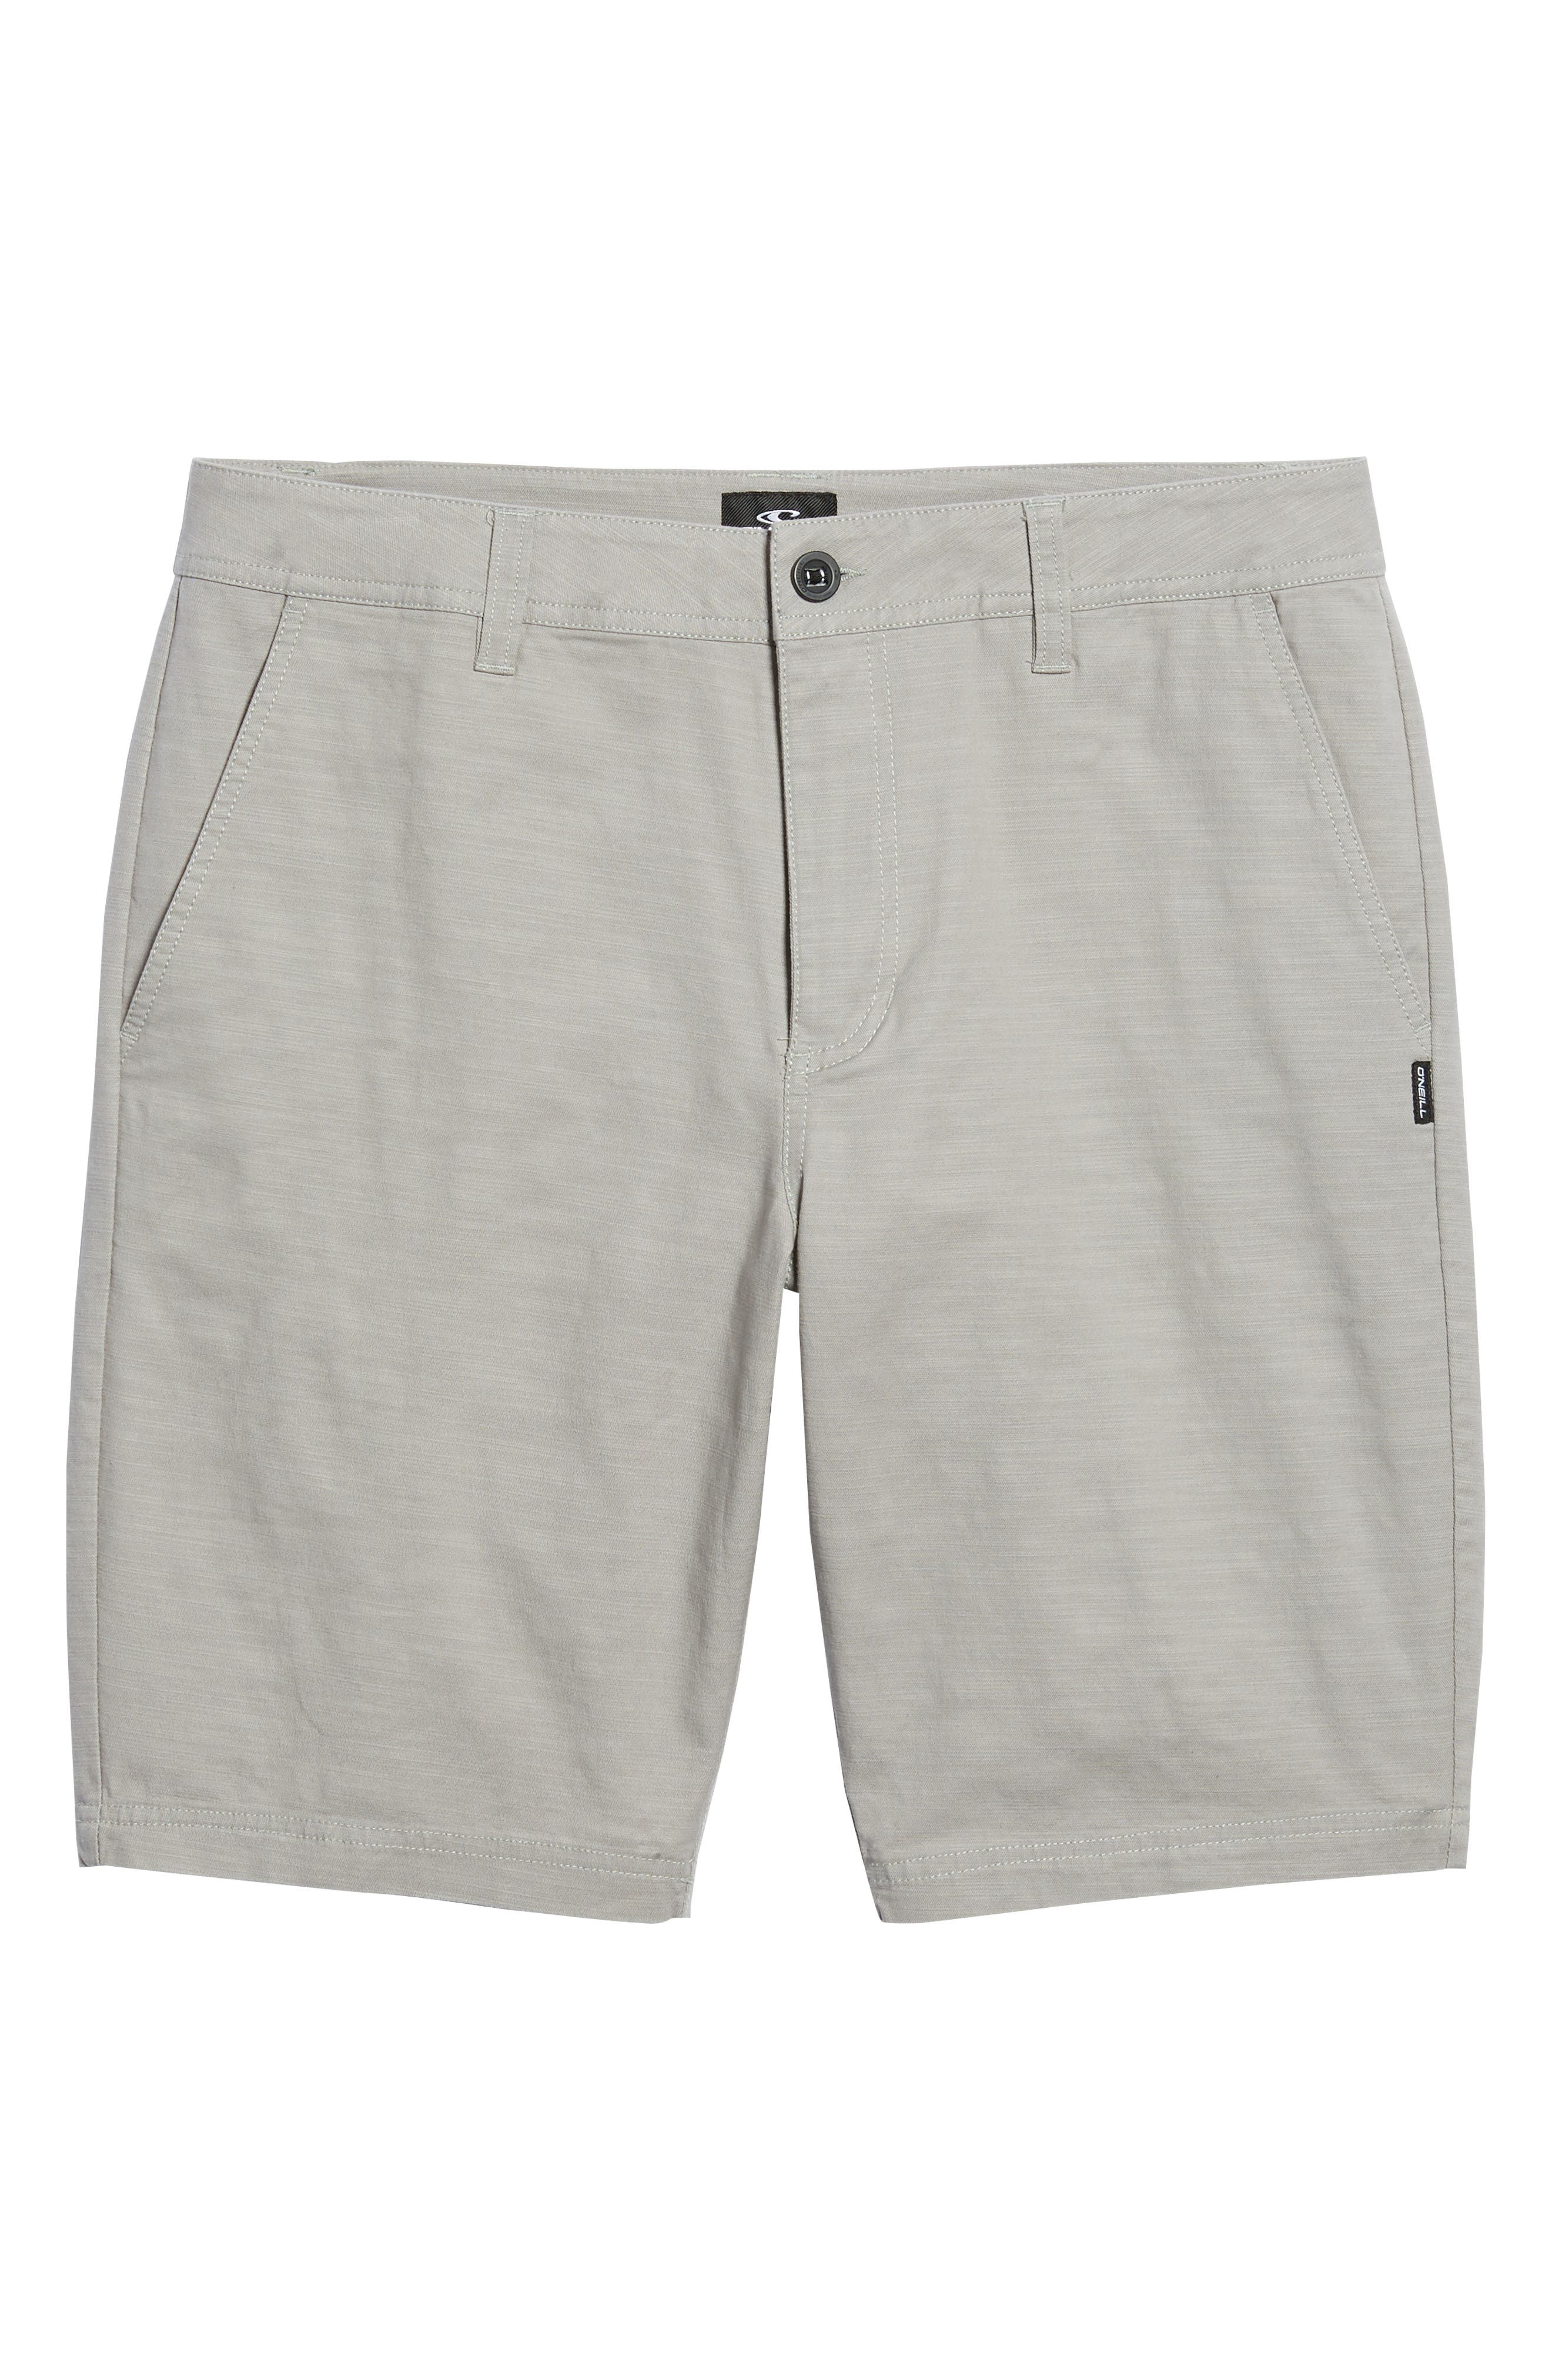 Jay Stretch Chino Shorts,                             Alternate thumbnail 6, color,                             Light Grey